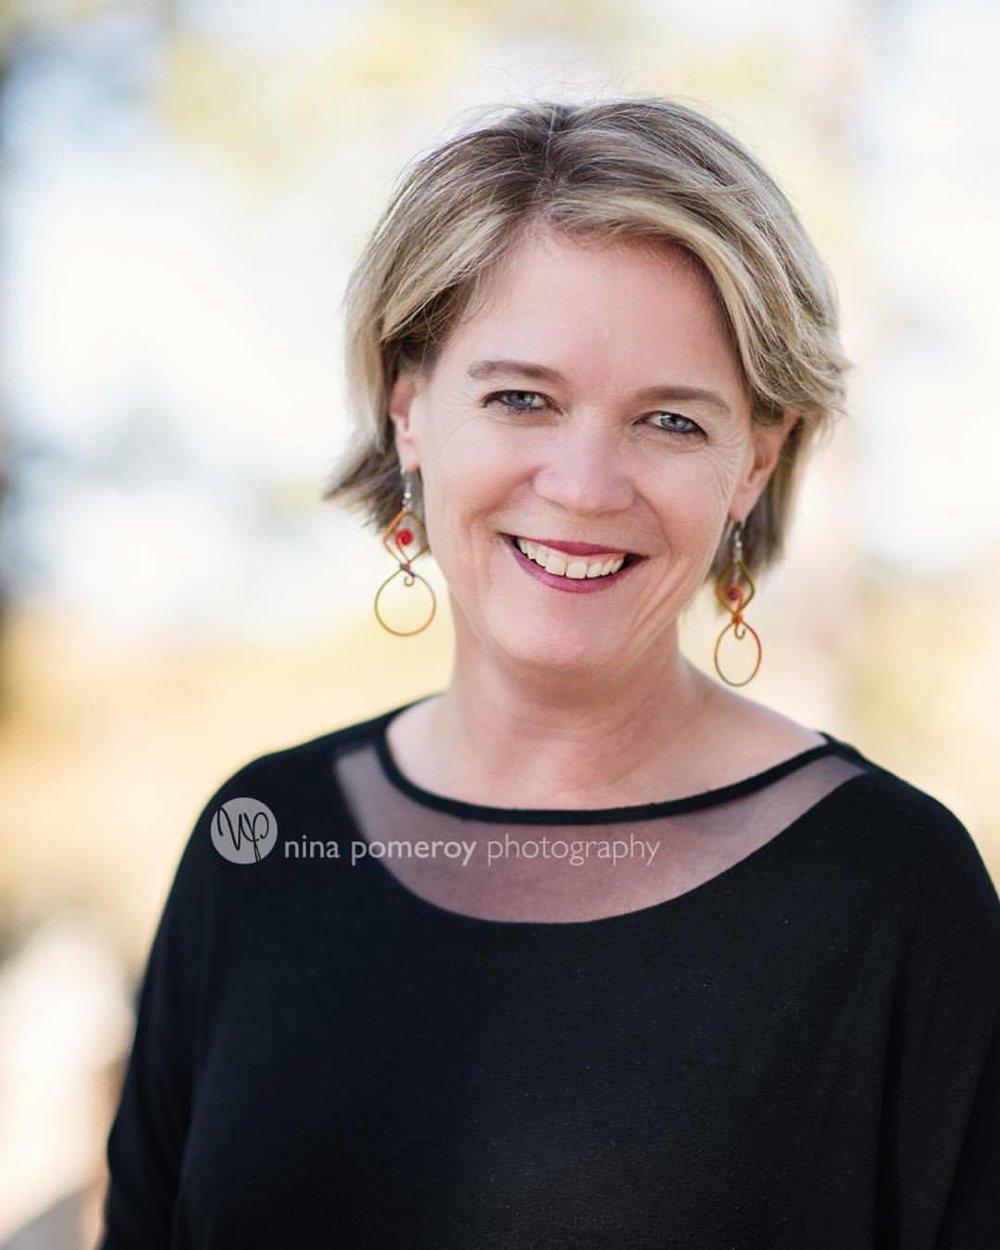 chairwoman-headshot-photographer-nina-pomeroy-sanfrancisco.jpg